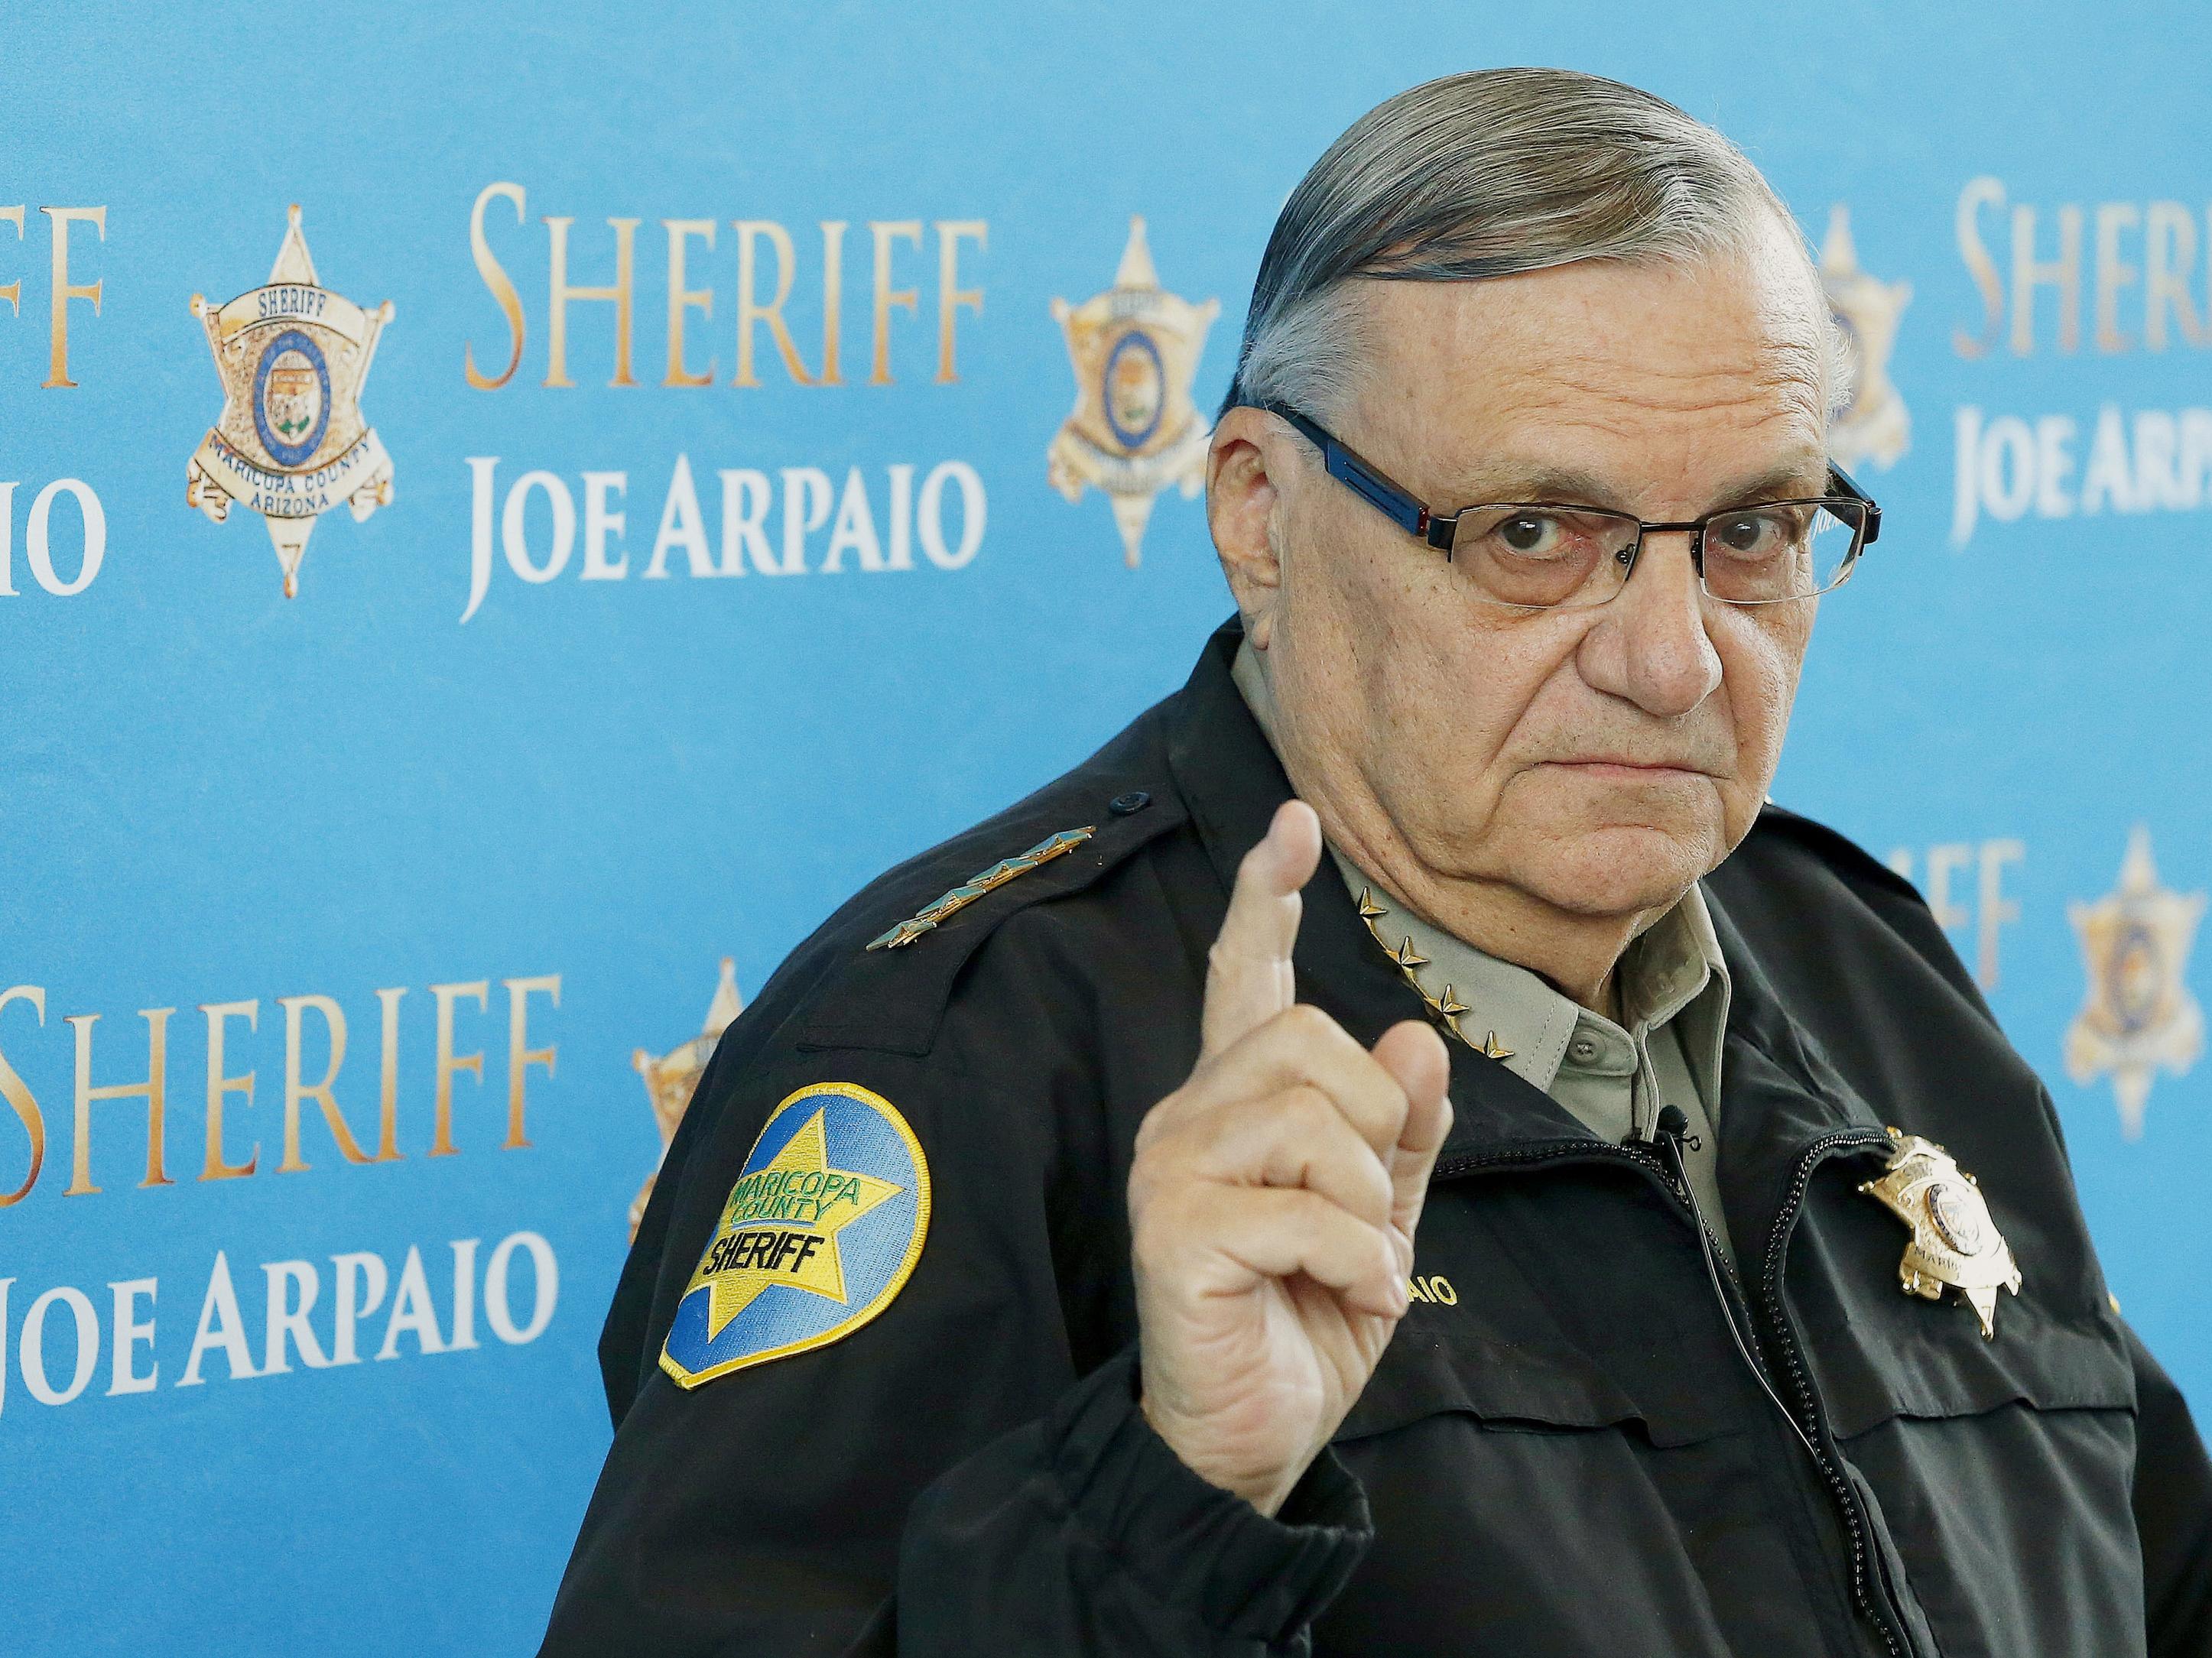 In Racial Profiling Lawsuit, Ariz. Judge Rules Sheriff Arpaio In Contempt Of Court